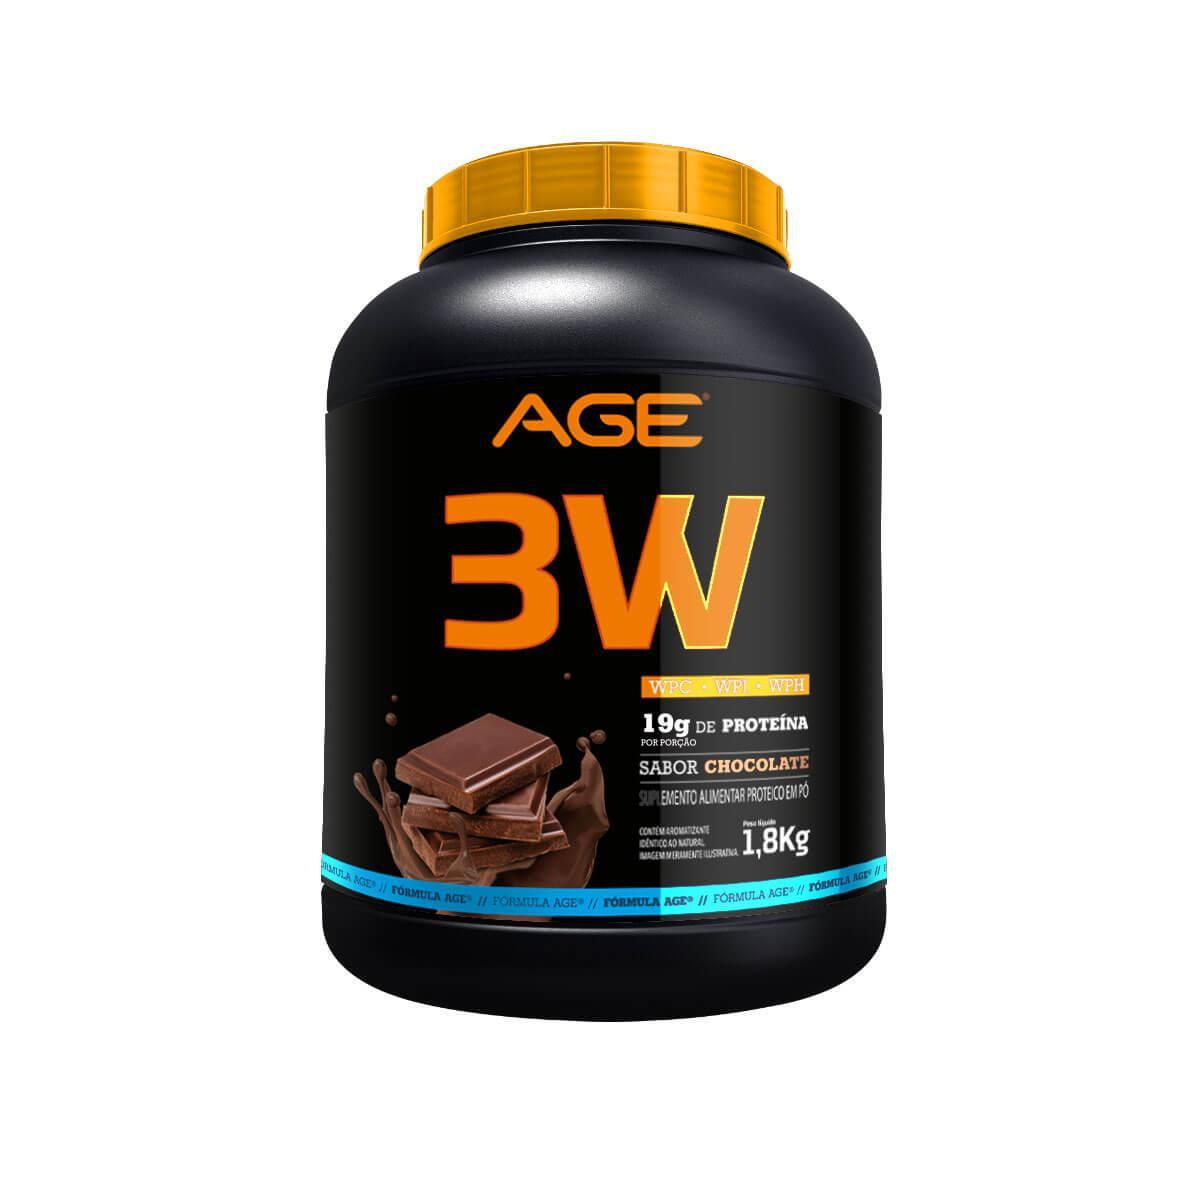 3W AGE (1,8Kg) - Chocolate - AGE